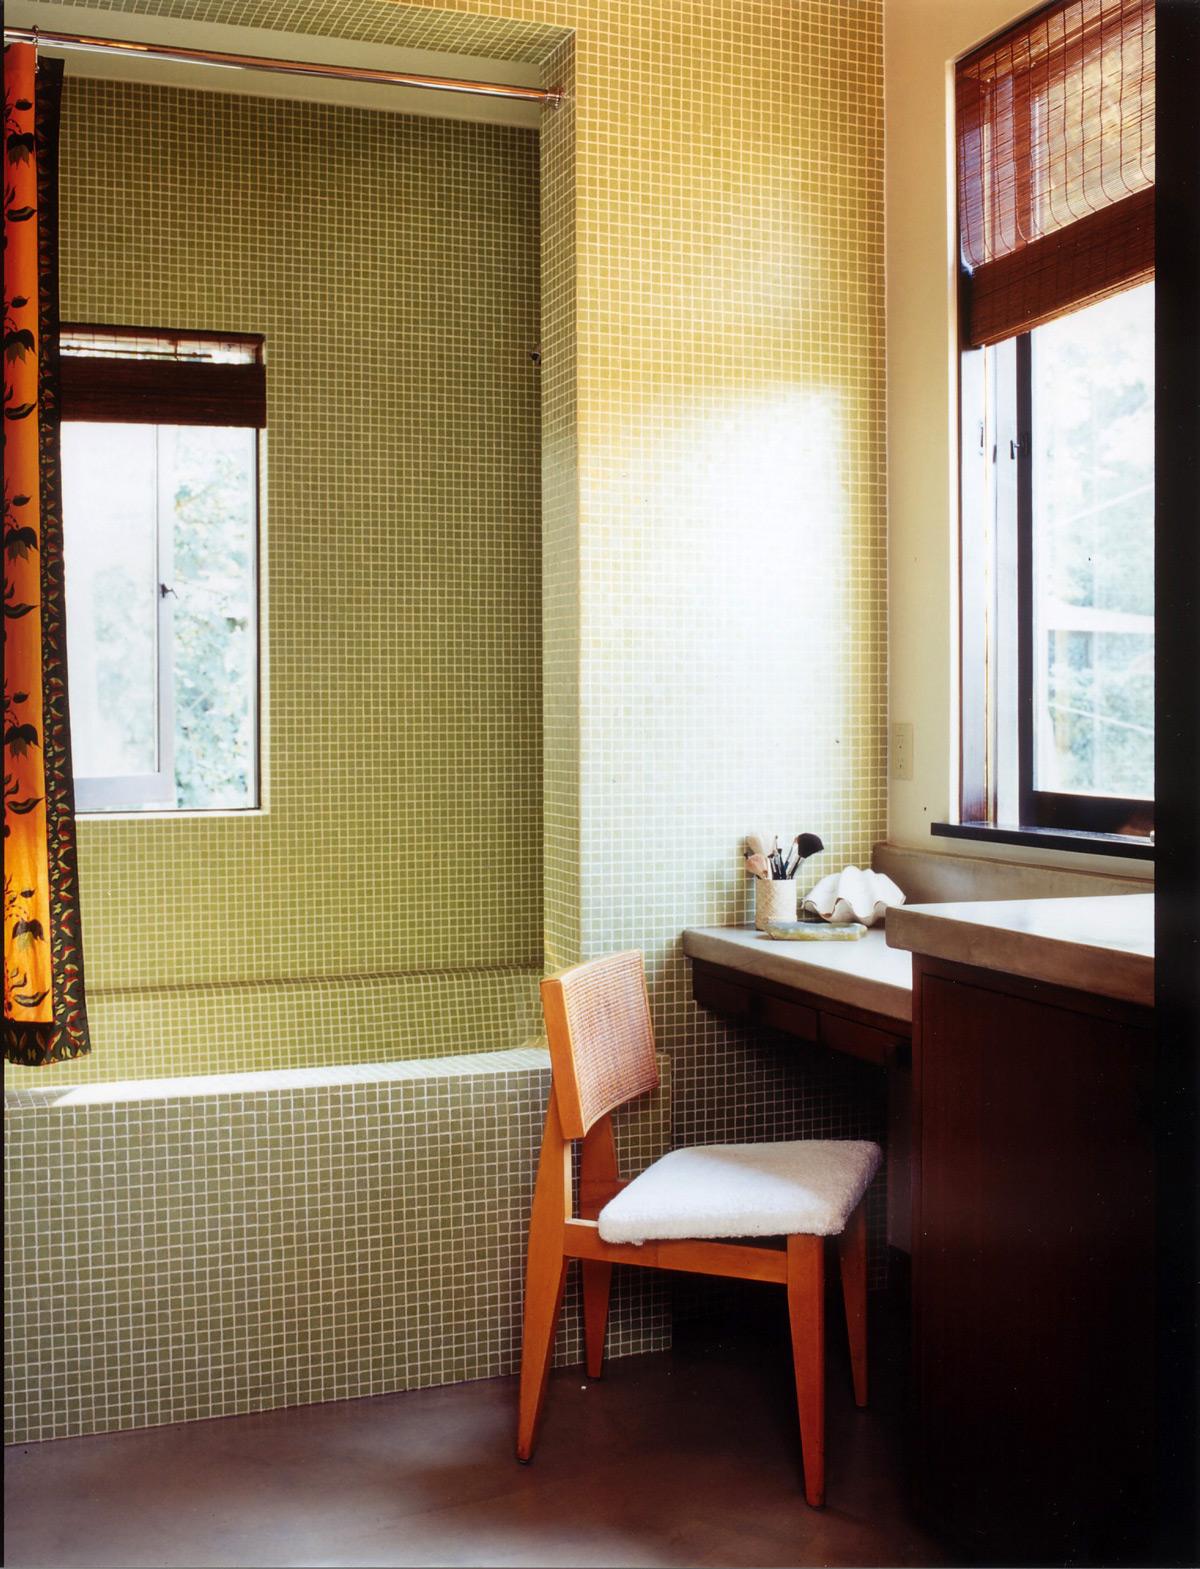 Day-Residence-bath.jpg